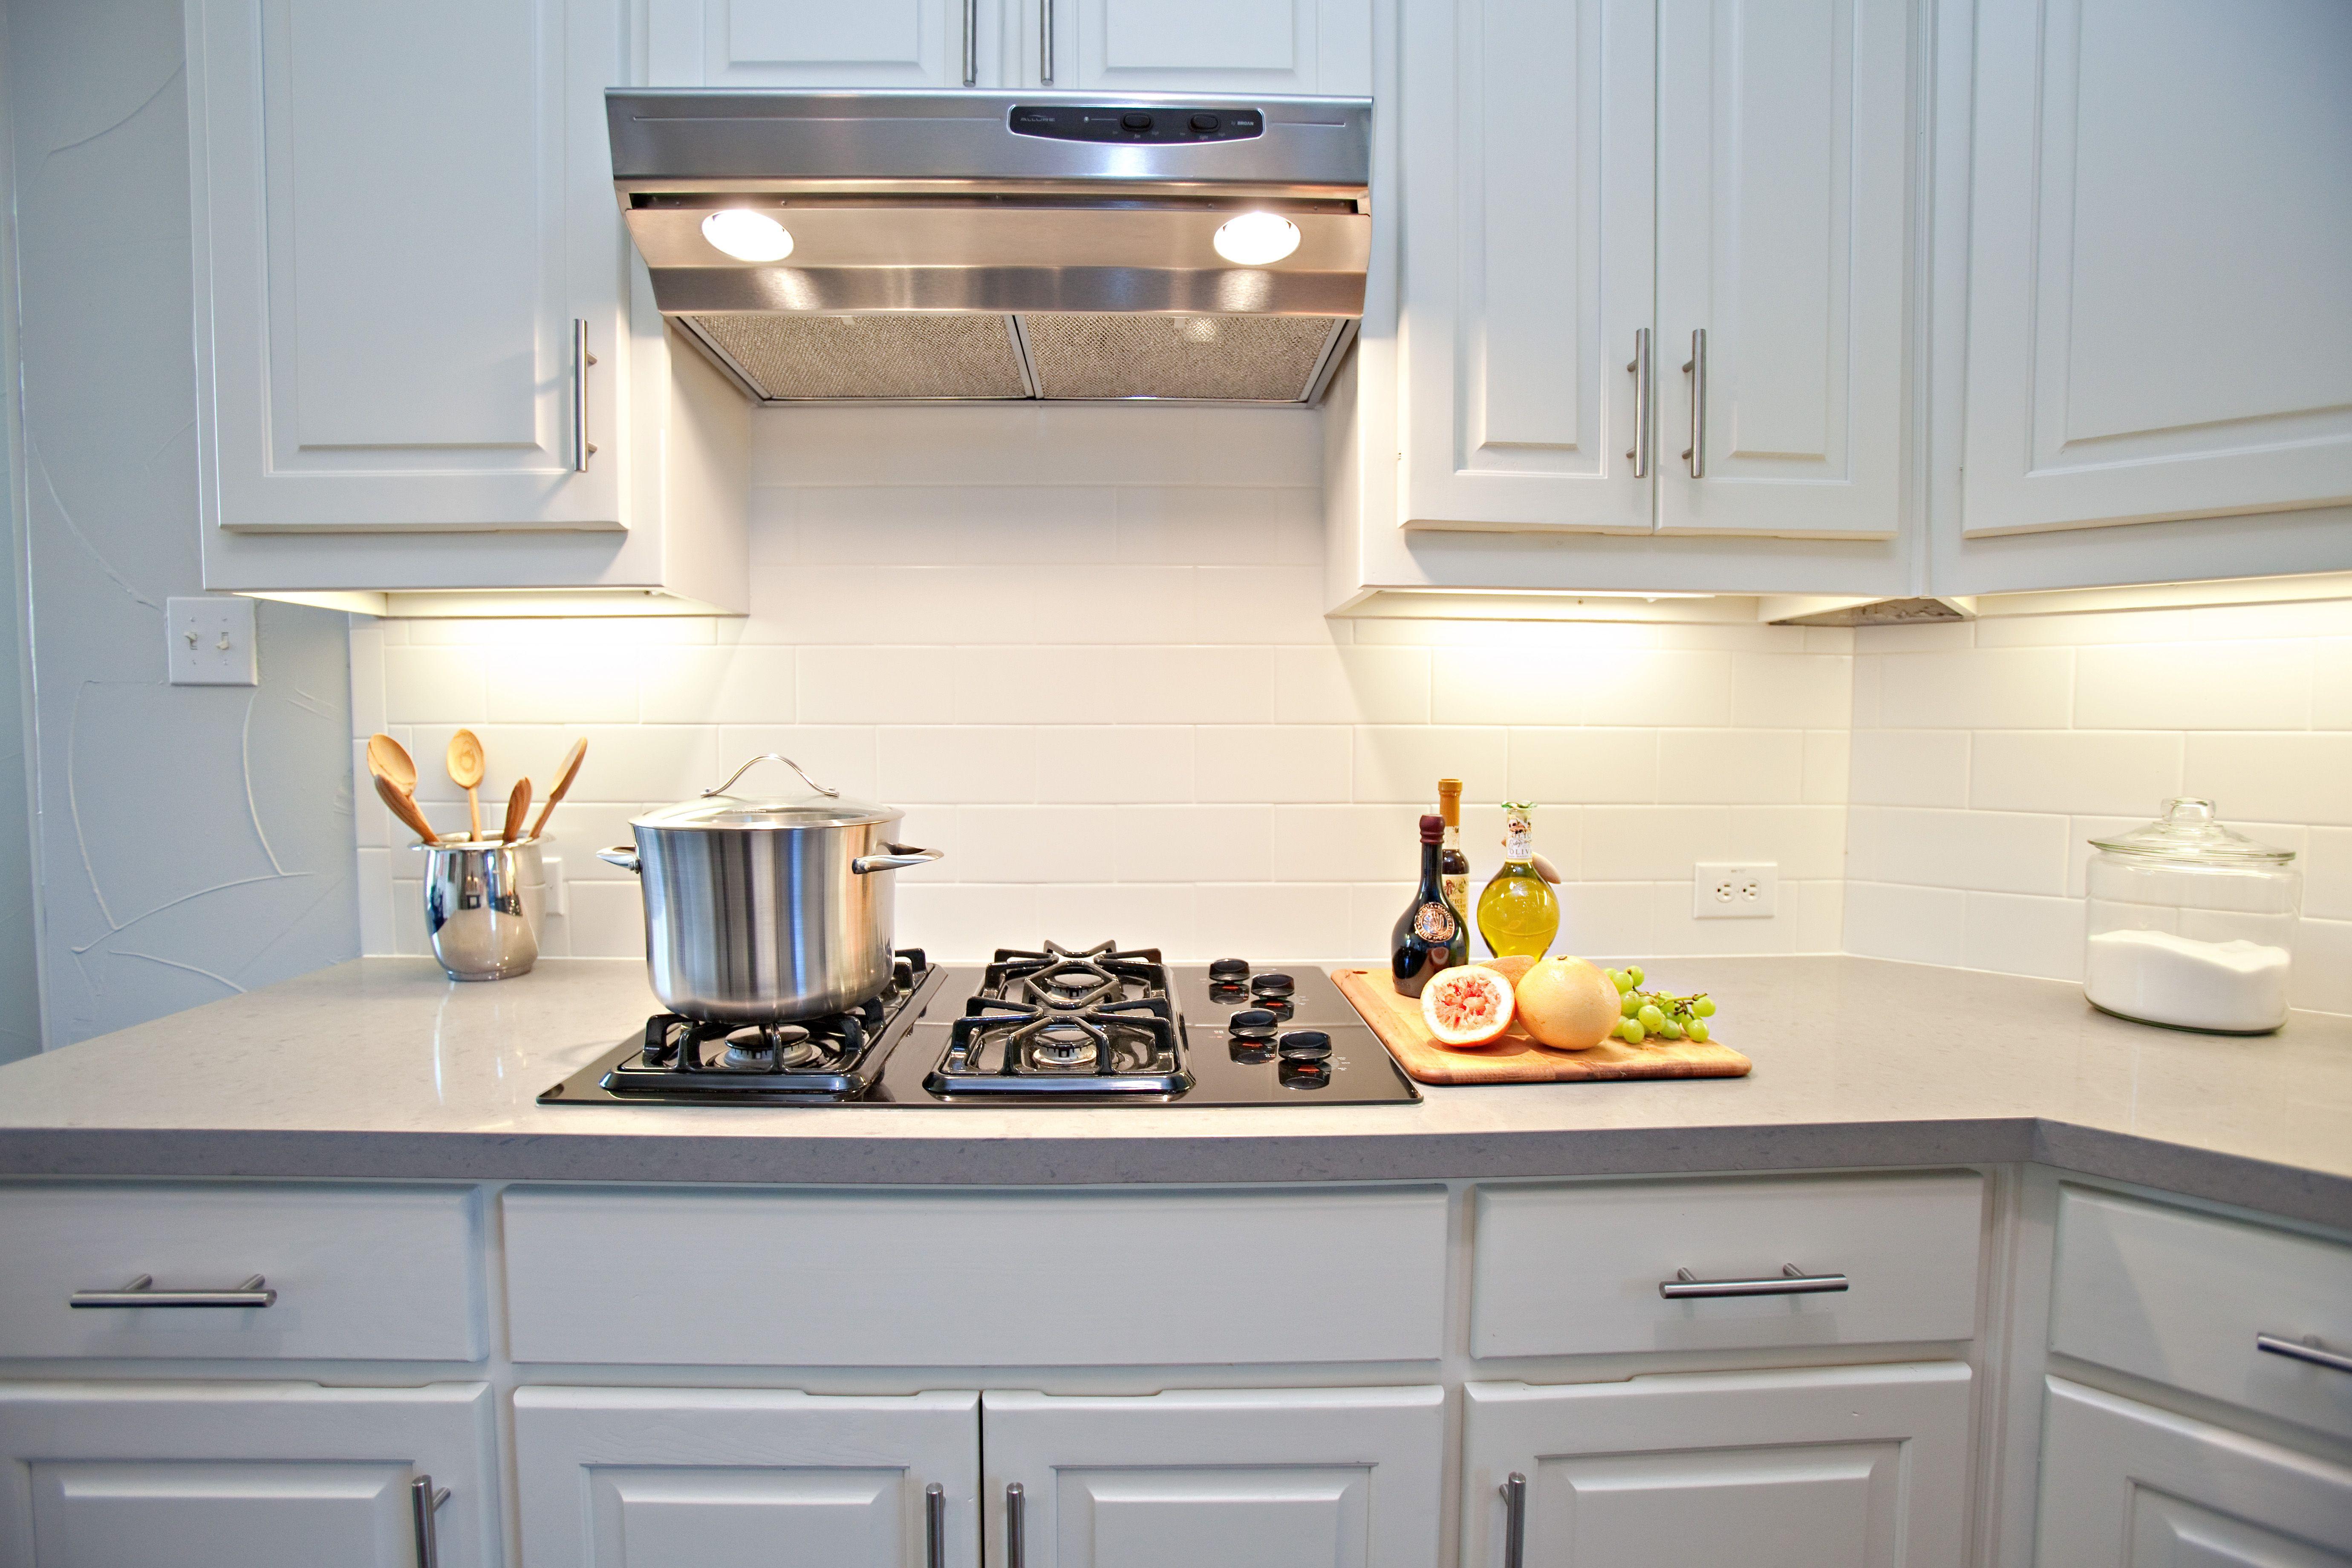 Backsplashes For White Kitchens From Images Of Kitchen Tile